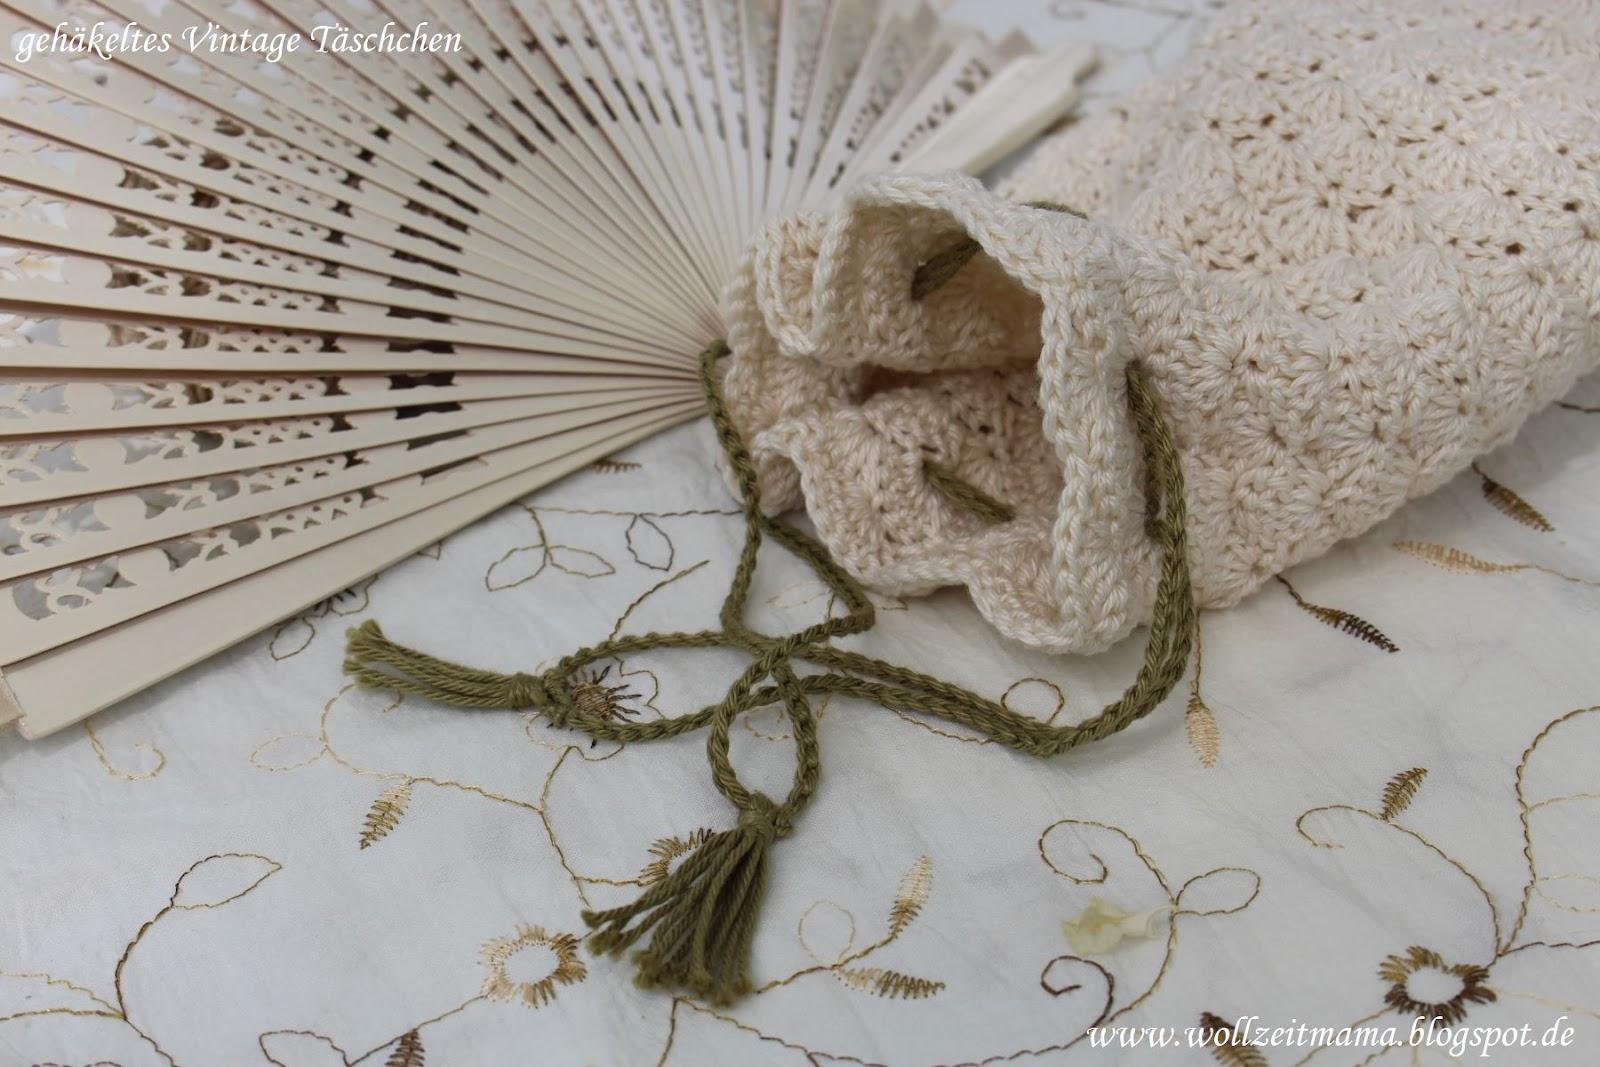 Wollzeitmama: Vintage Täschchen häkeln